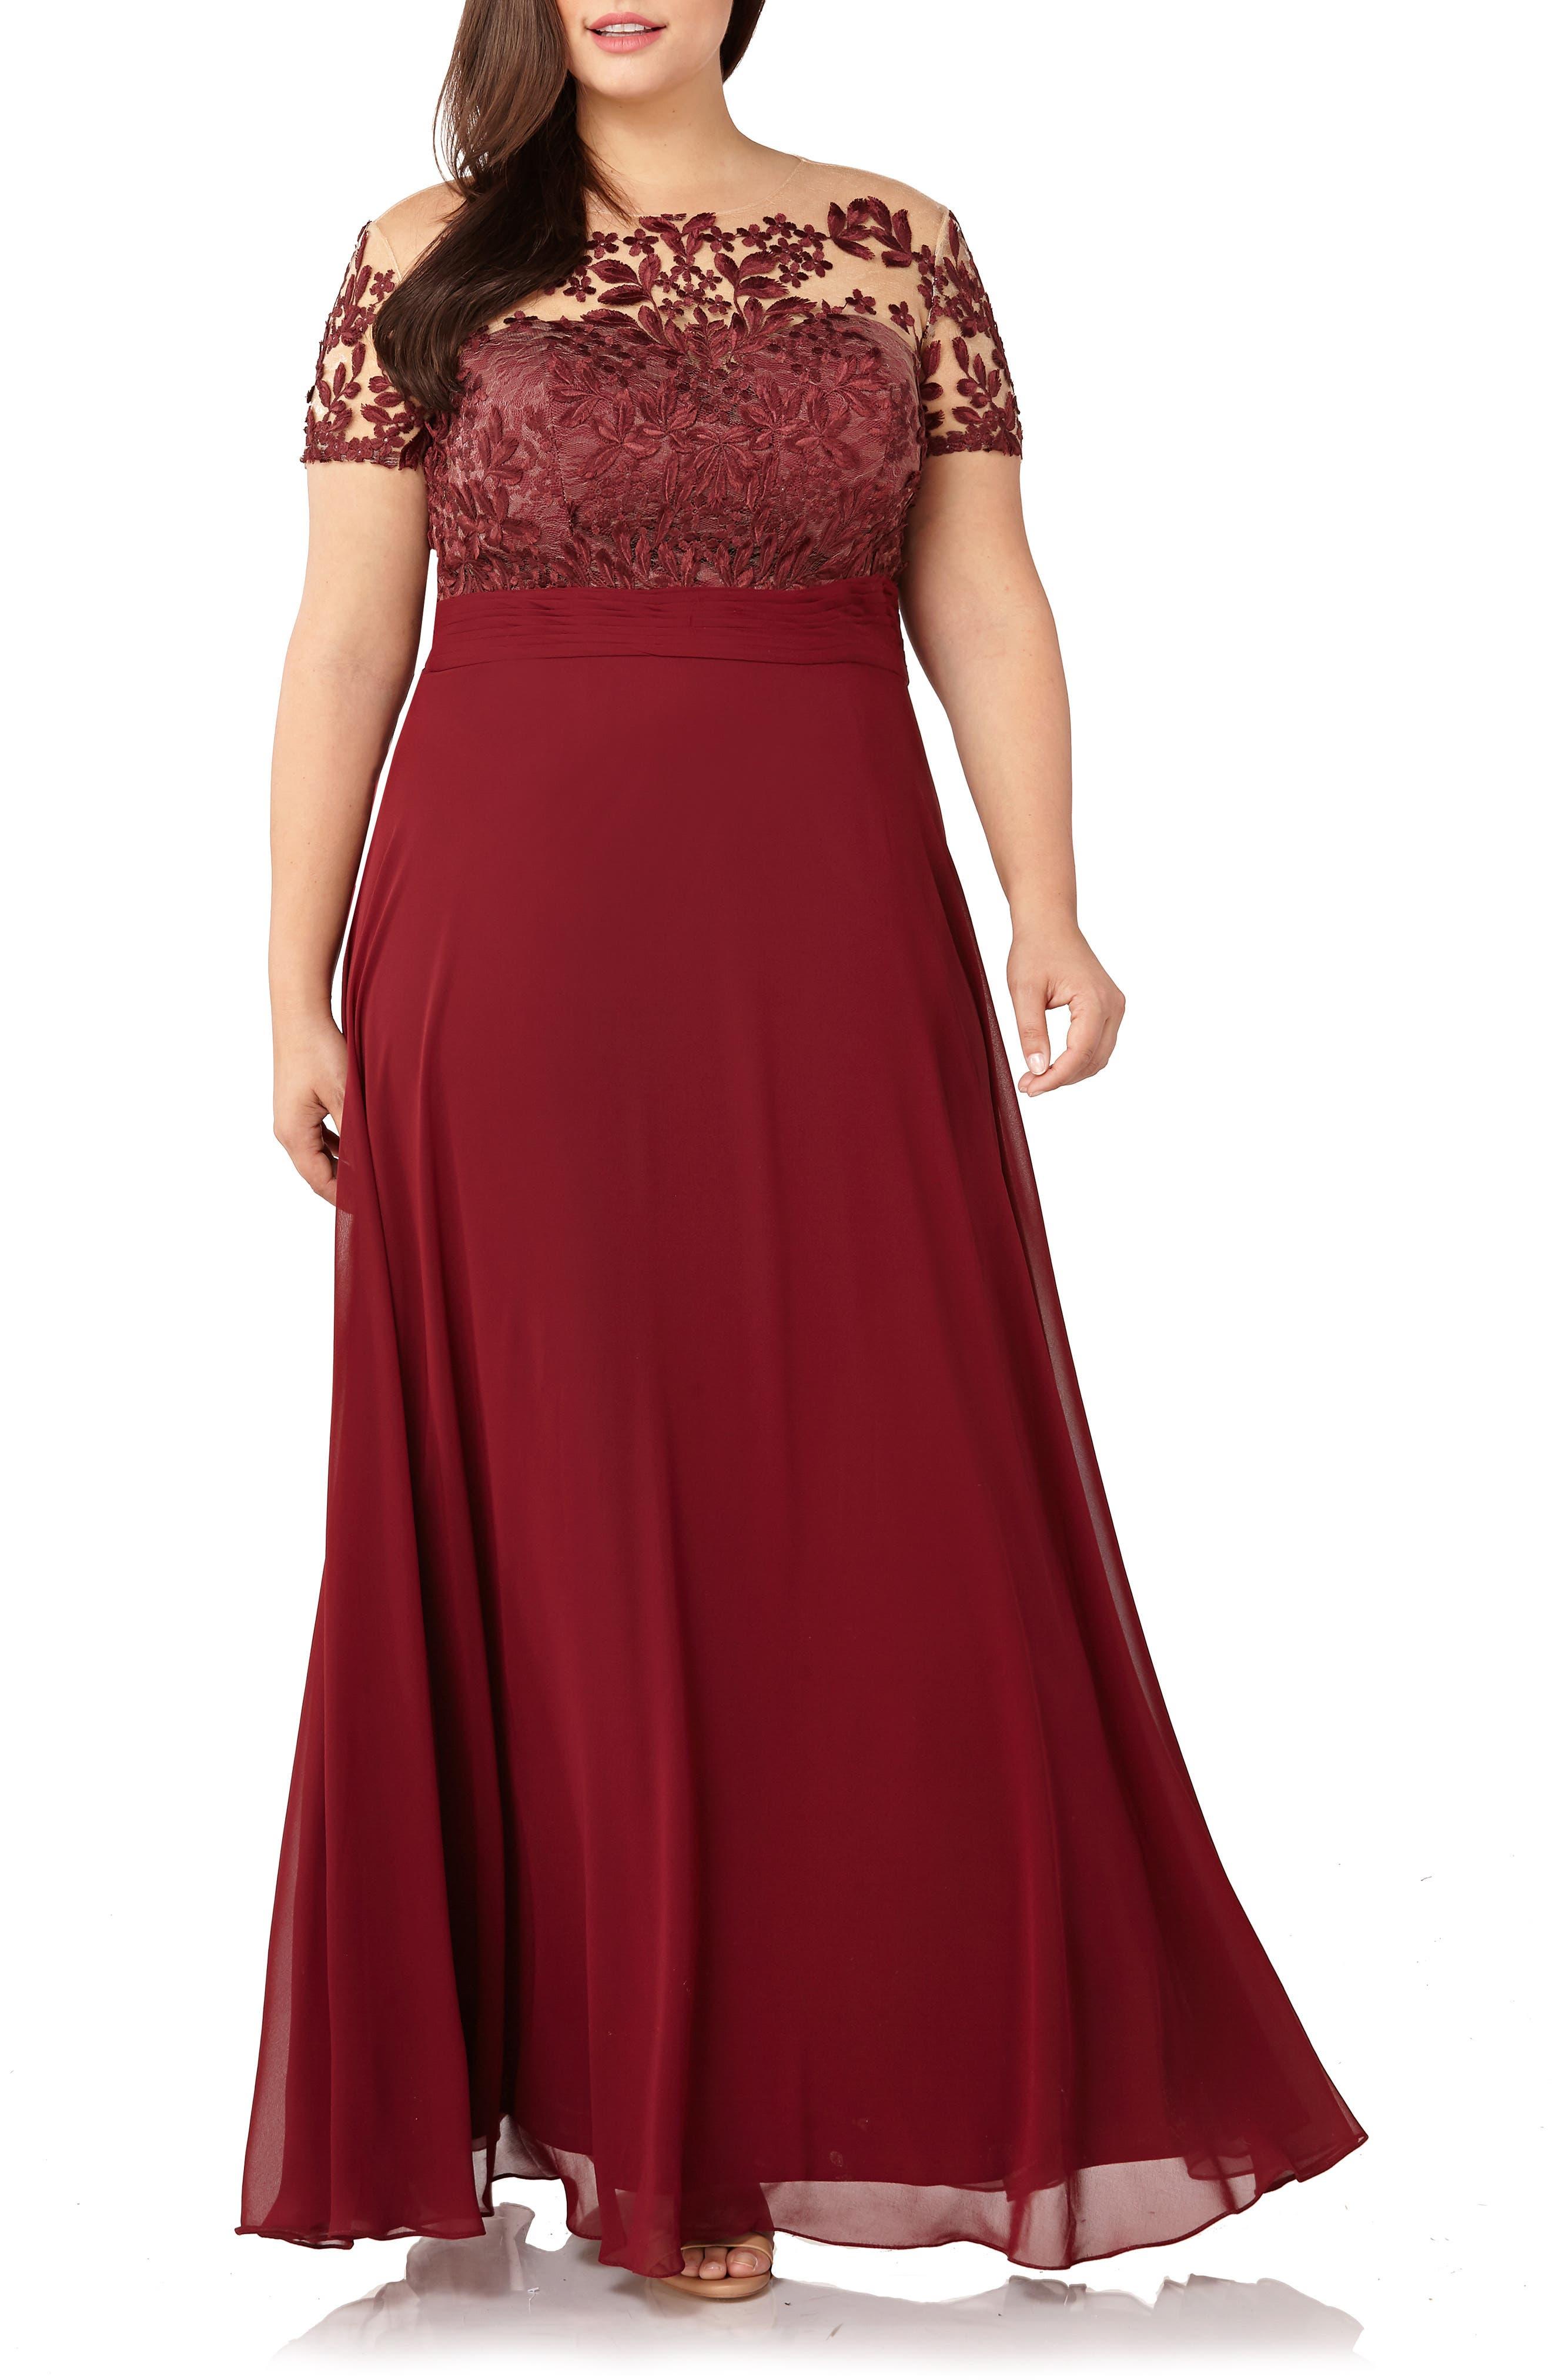 Red Long Sleeve Semi Formal Dress Nordstrum